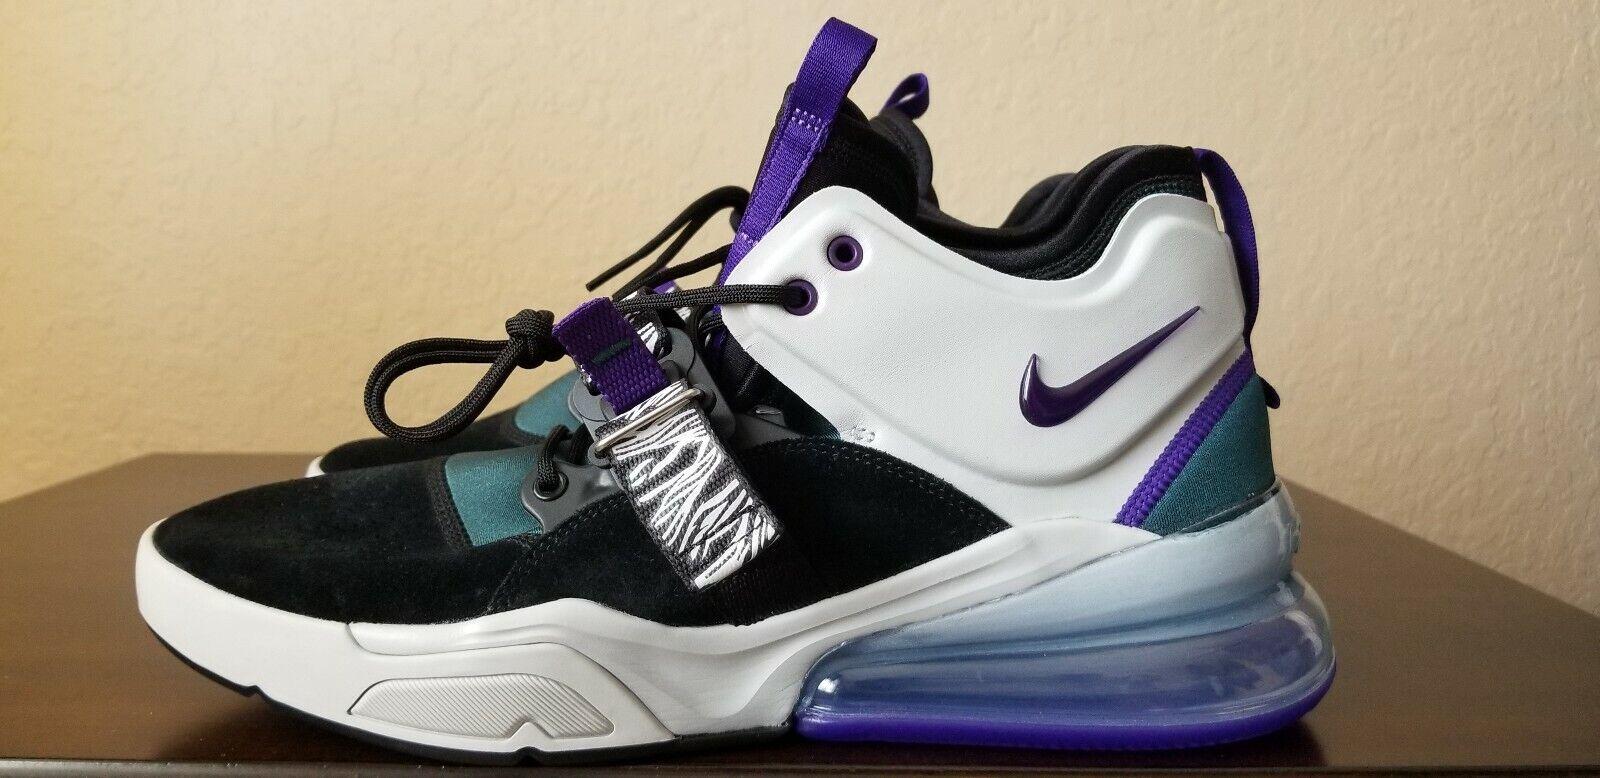 NEW Nike Air Force 270 'Carnivore' Black Purple AH6772 005 Men's Size 11.5